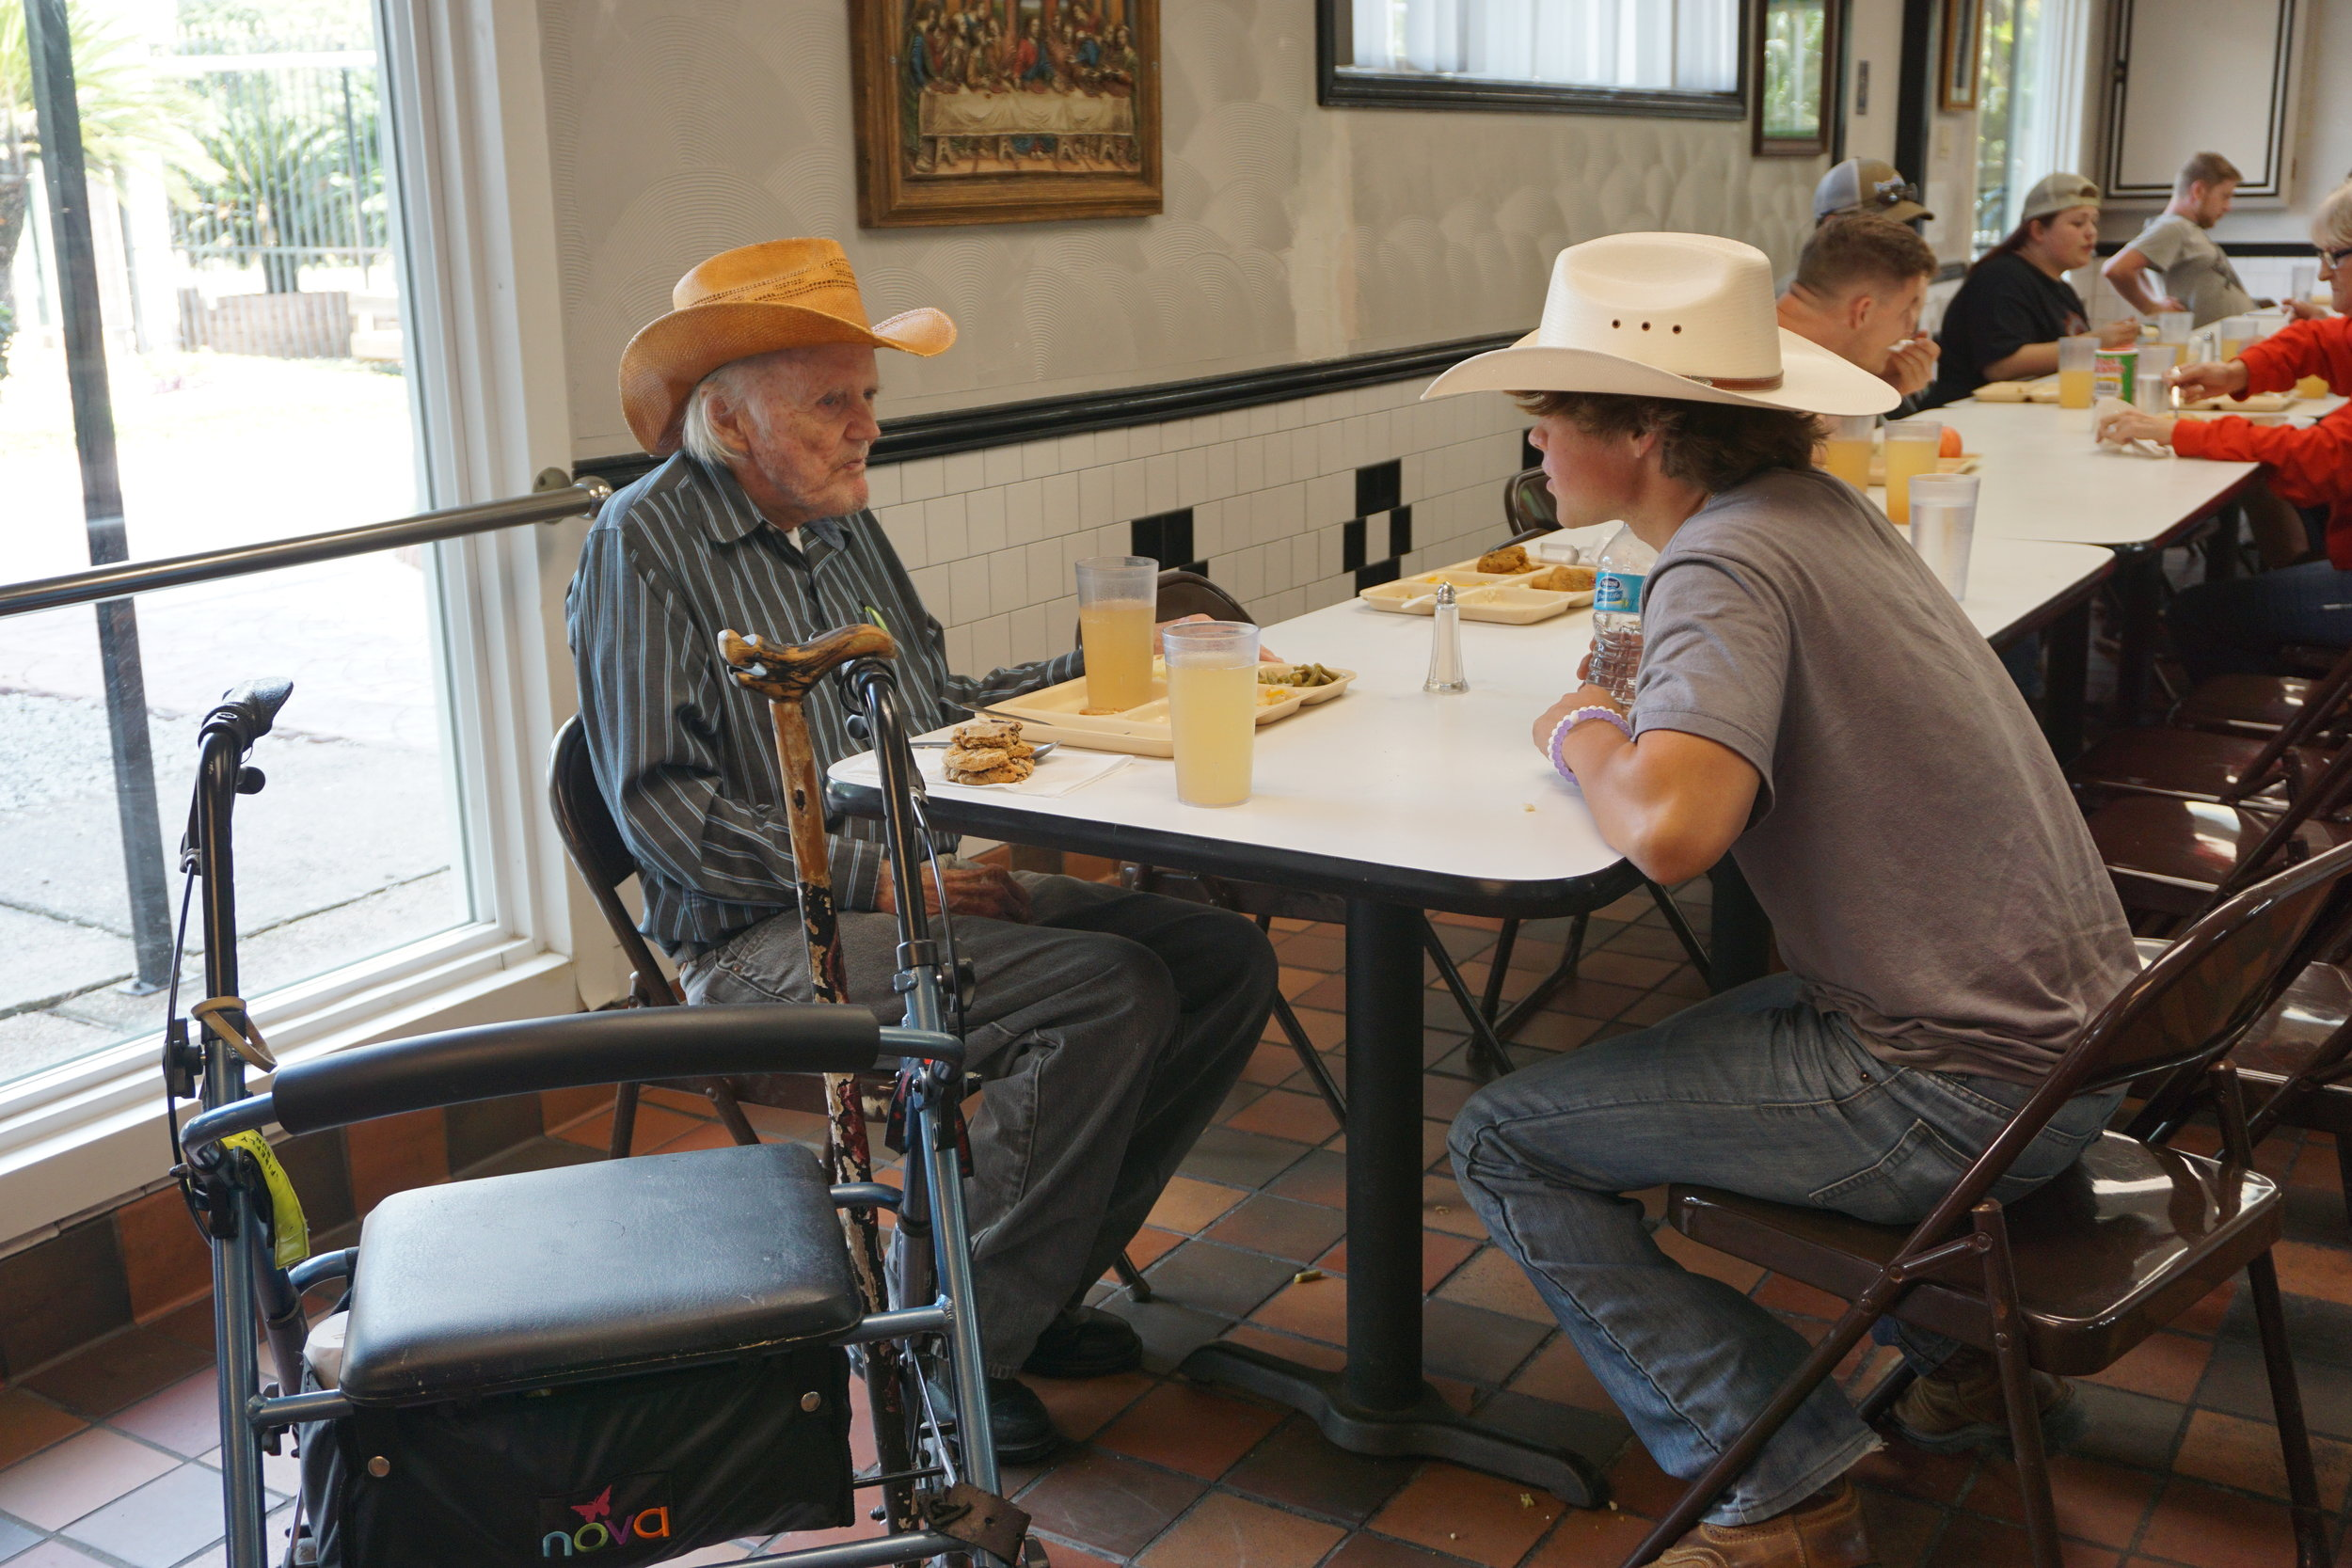 matching cowboy hats!